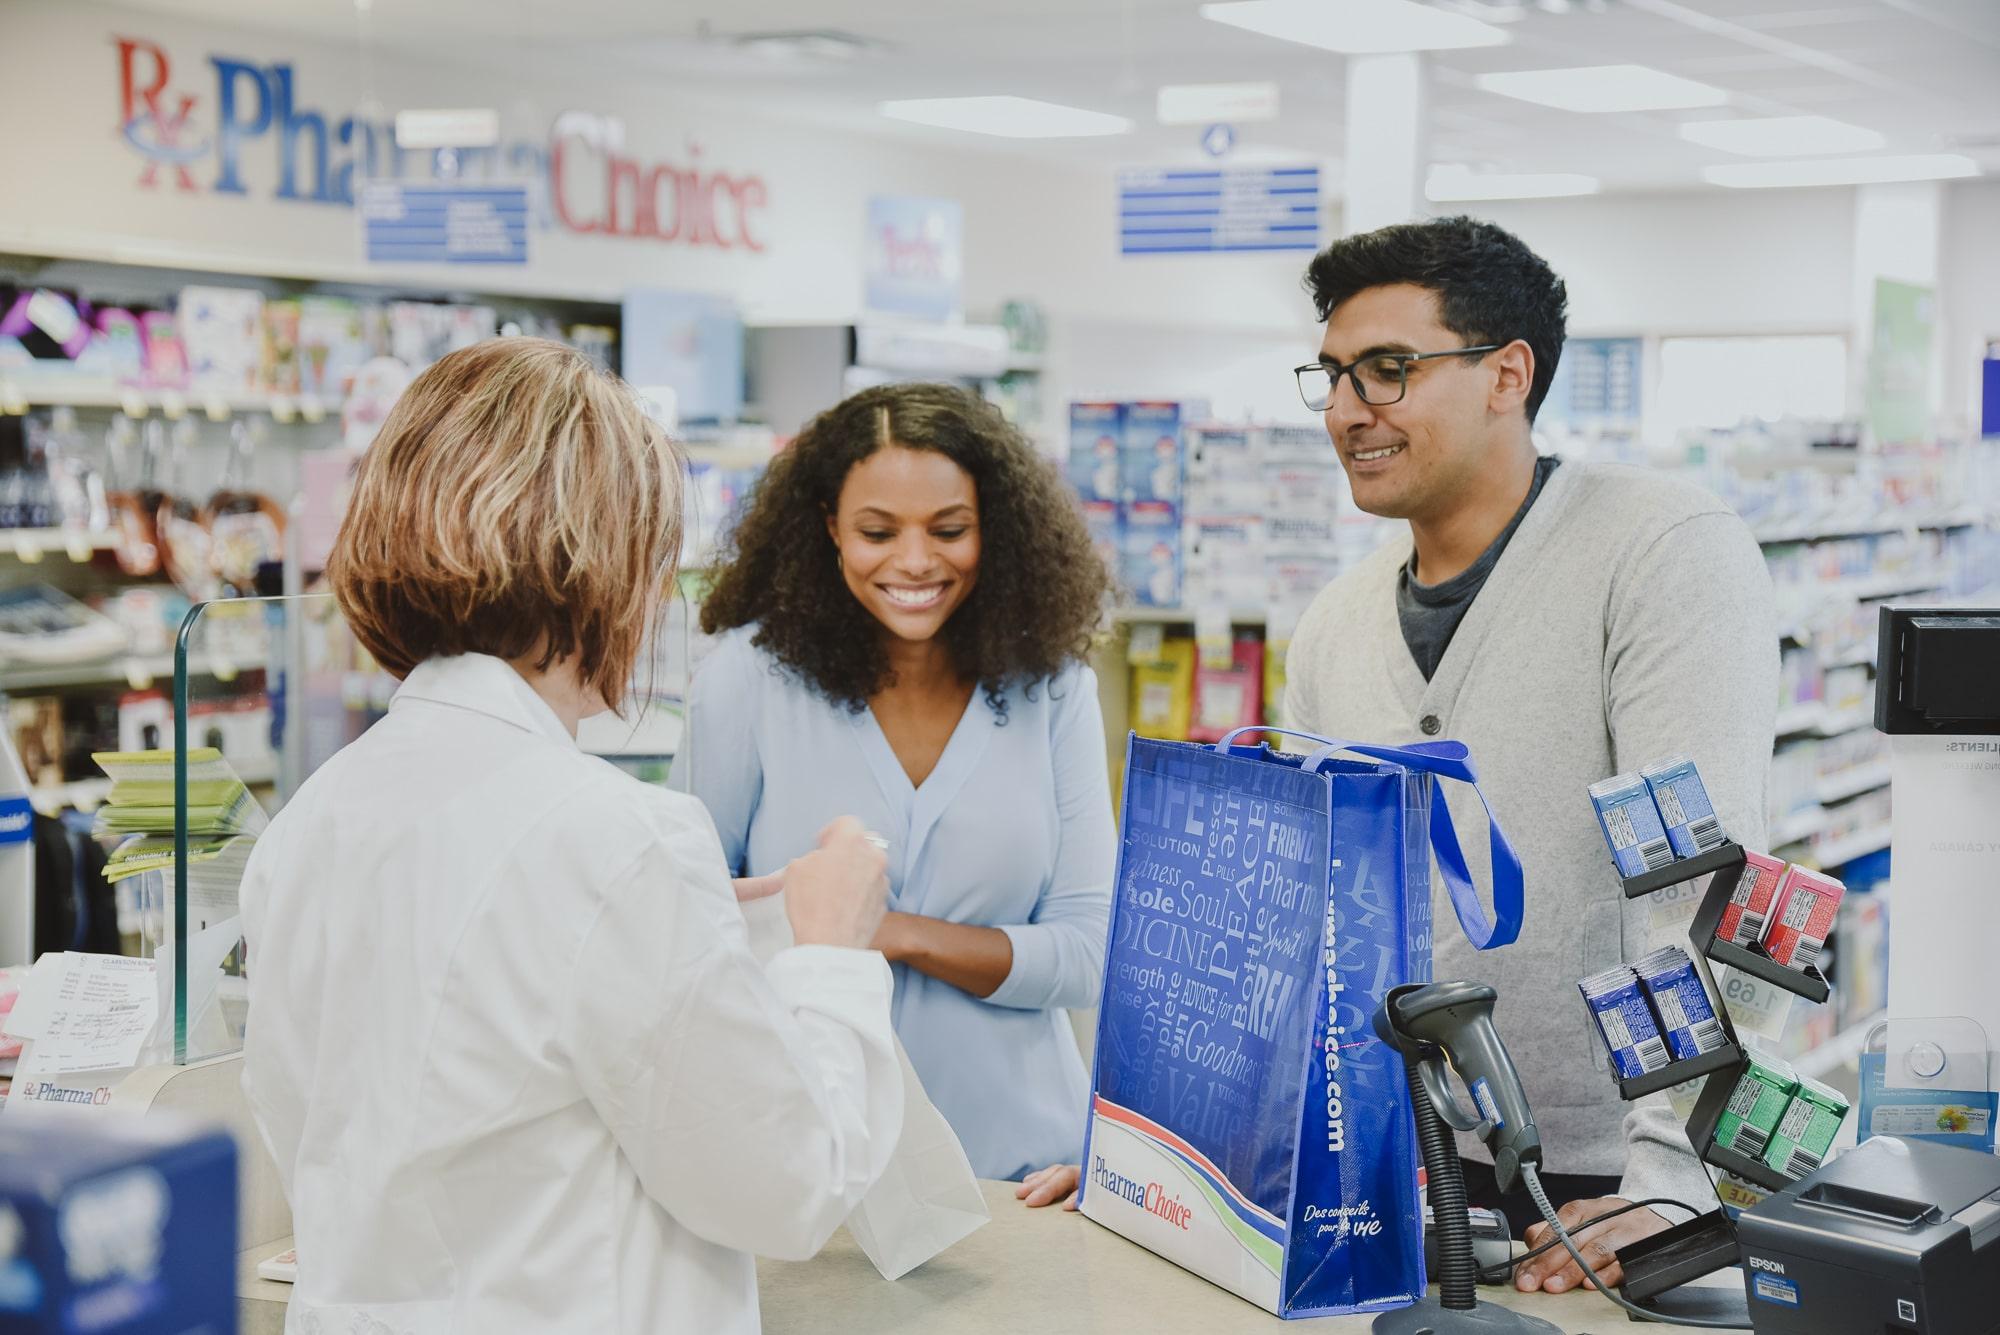 pharmachoice cashier